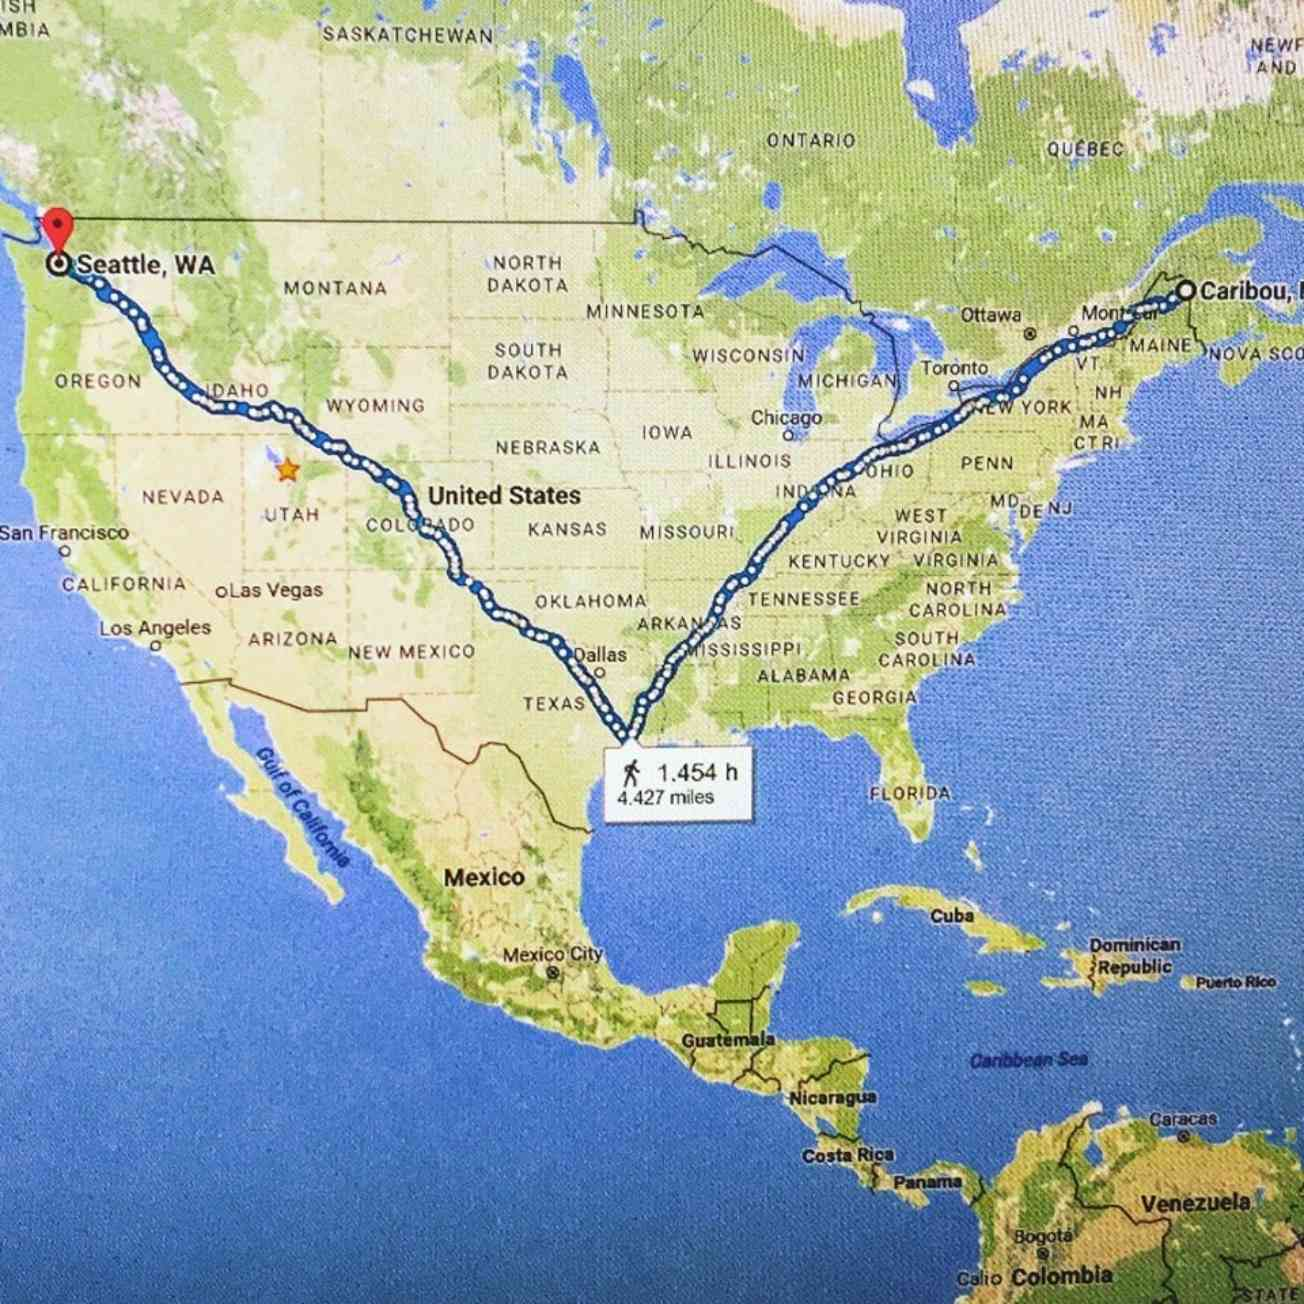 Maine To Houston To Seattle